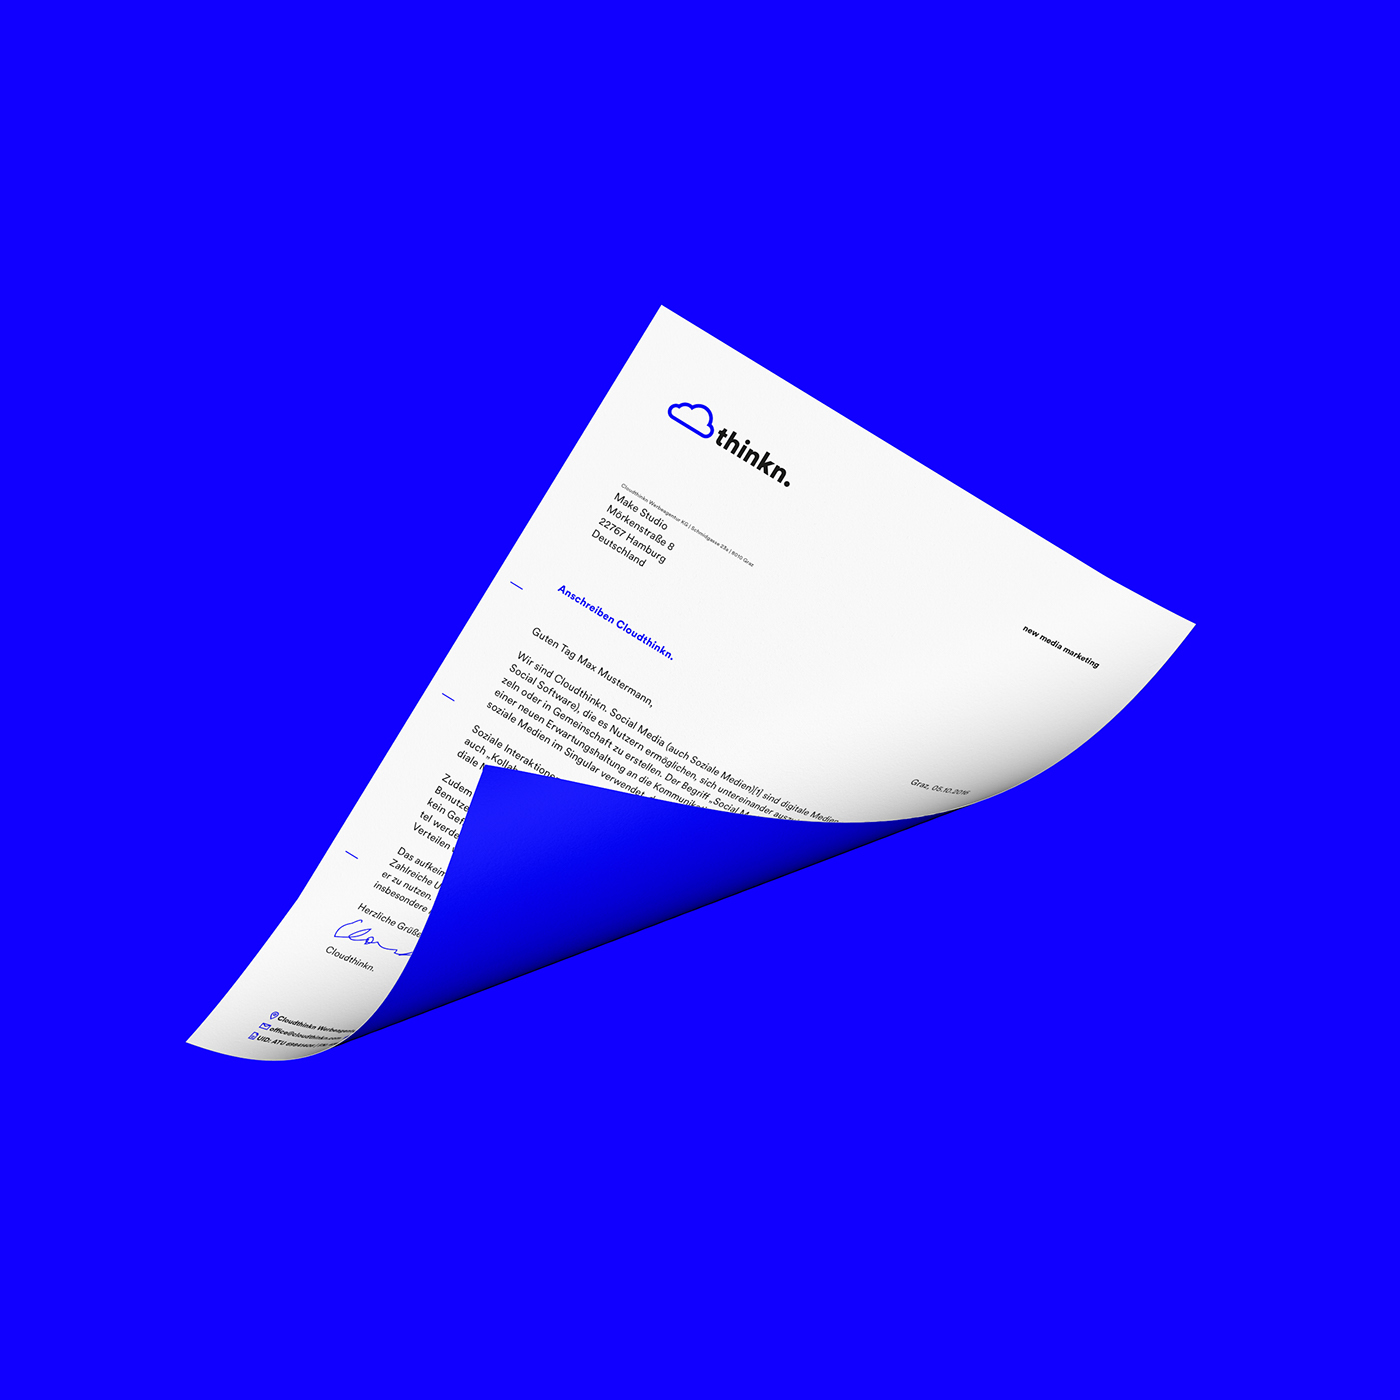 branding  madebymake cloudthinkn Corporate Design icons